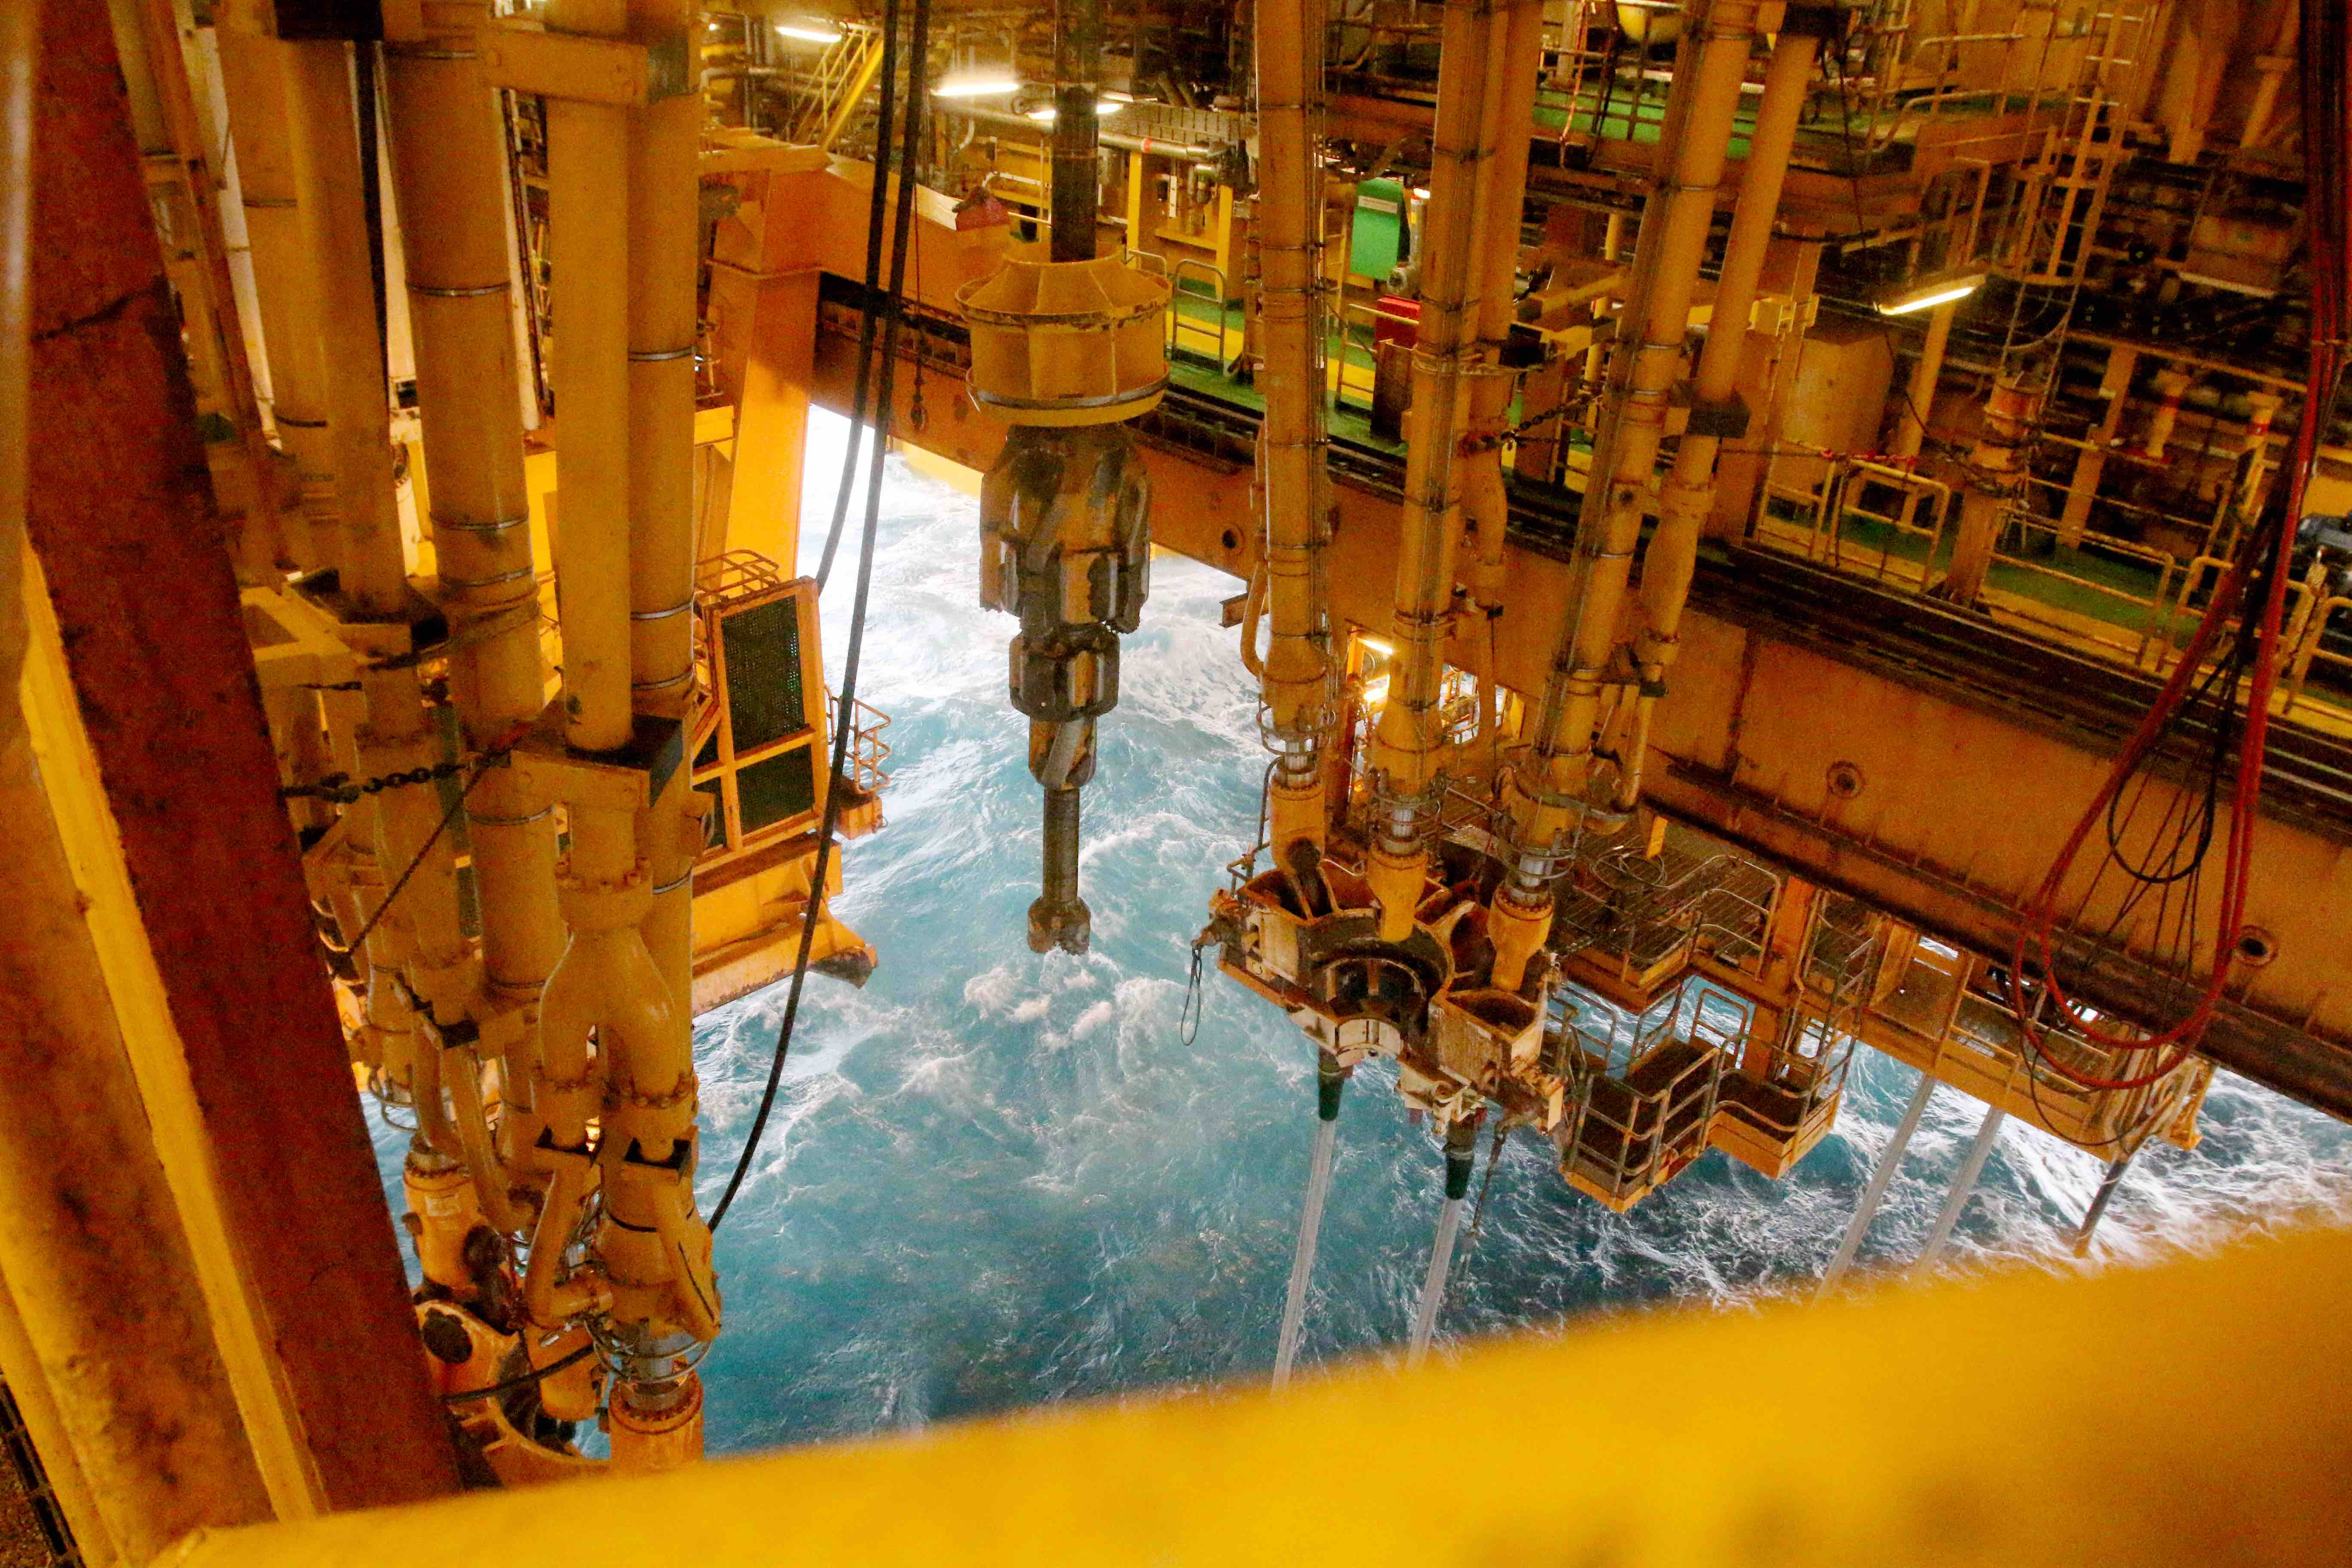 Kjetil Eide - Equinor - Drilling at Johan Sverdrup field - Case studies CST from Perigon